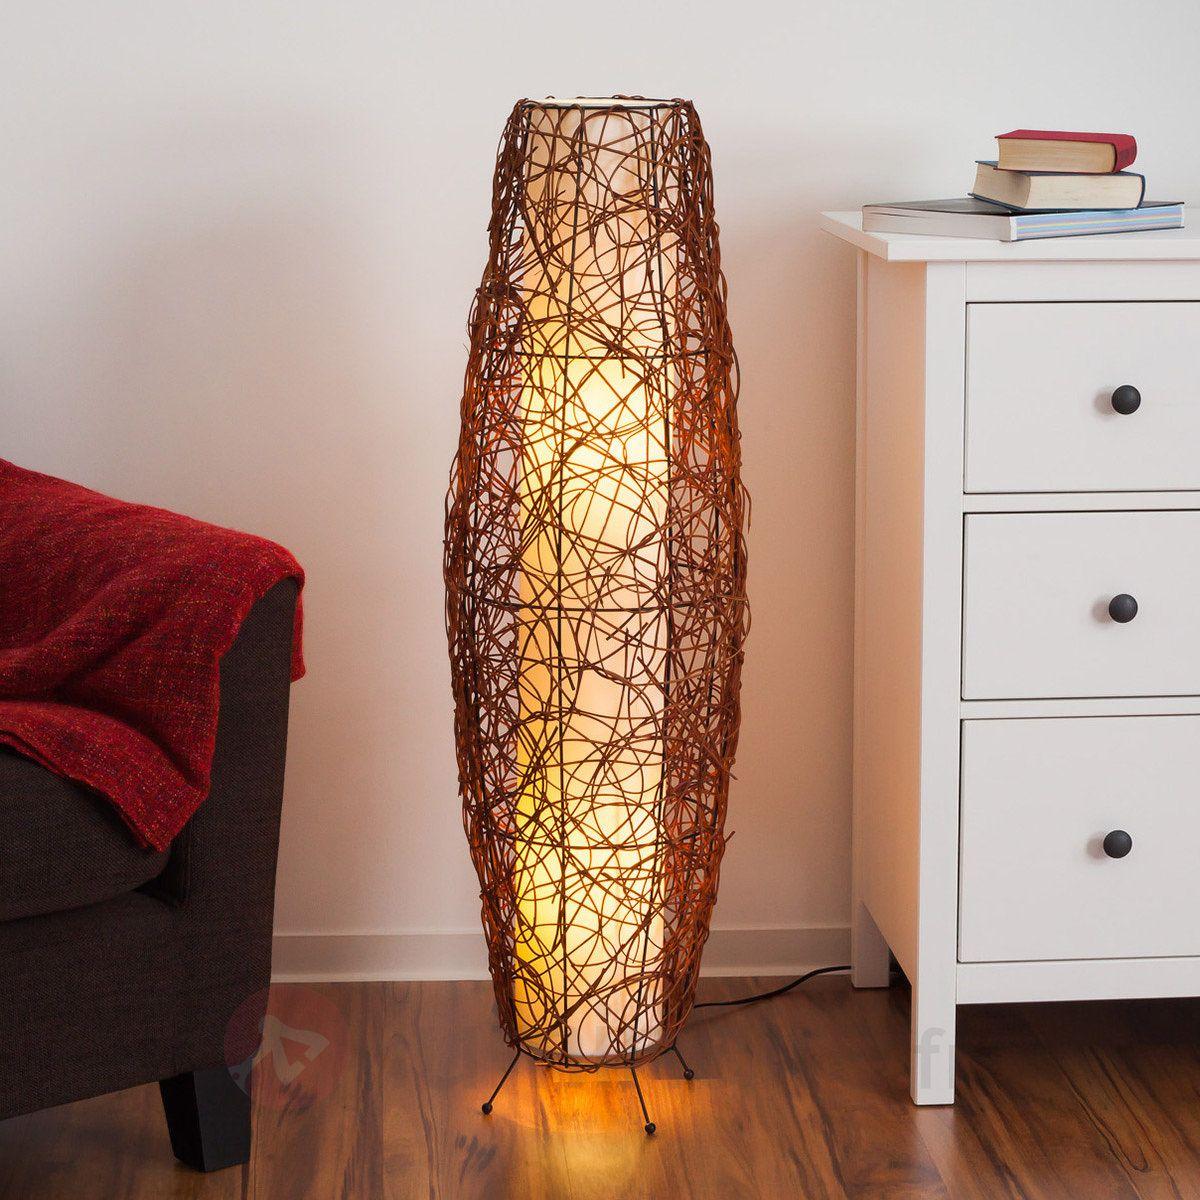 lampe de sol medine en rotin lampadaires pinterest. Black Bedroom Furniture Sets. Home Design Ideas